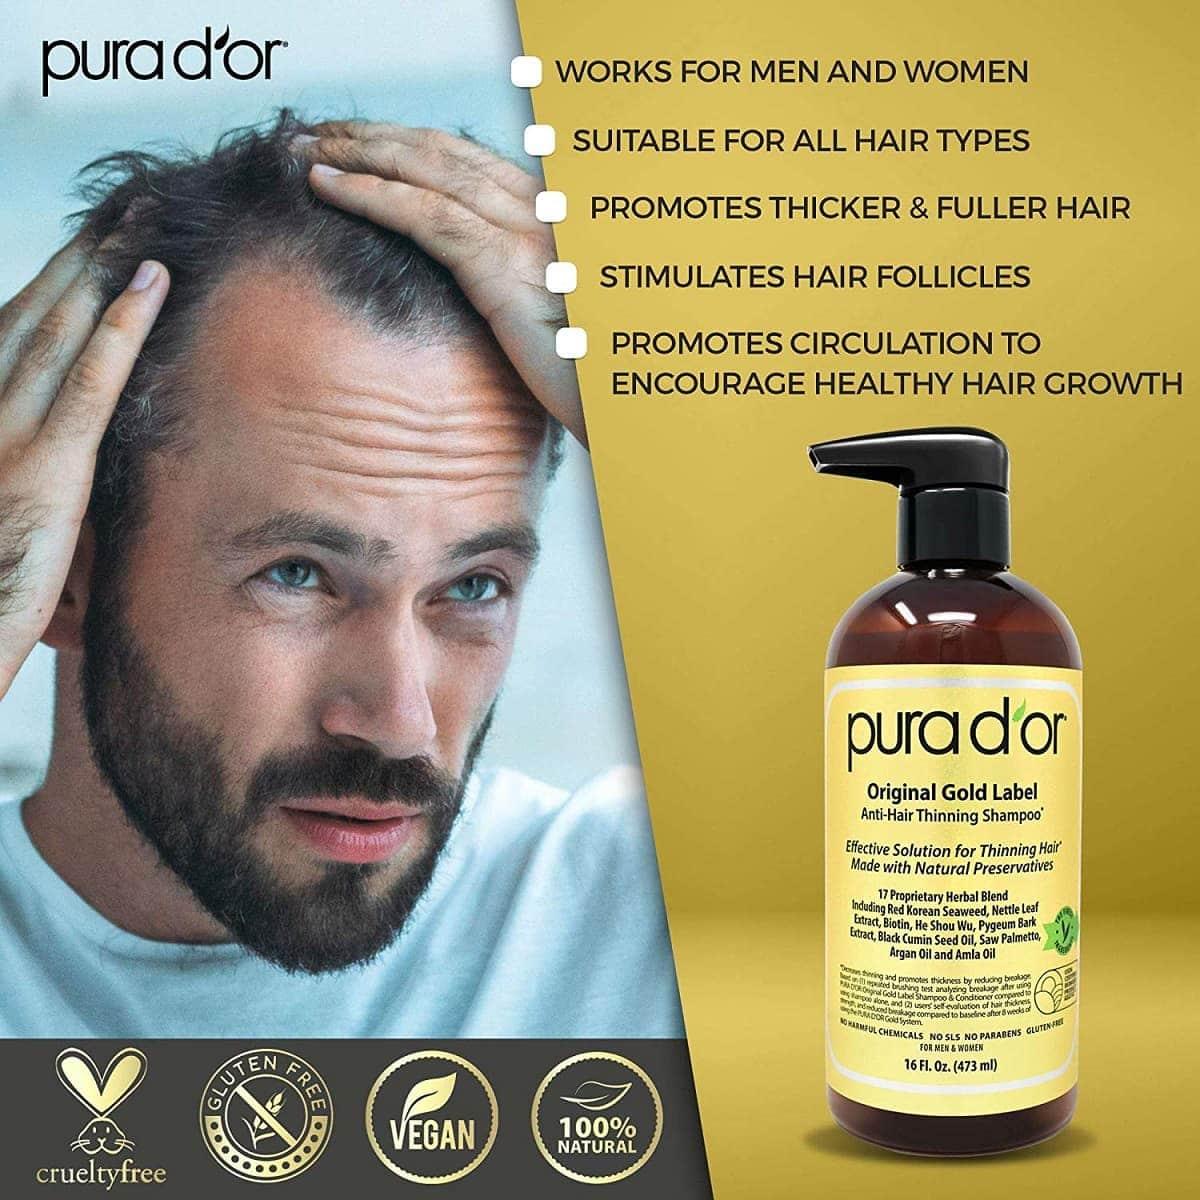 pura dor anti thinning shampoo conditioner image